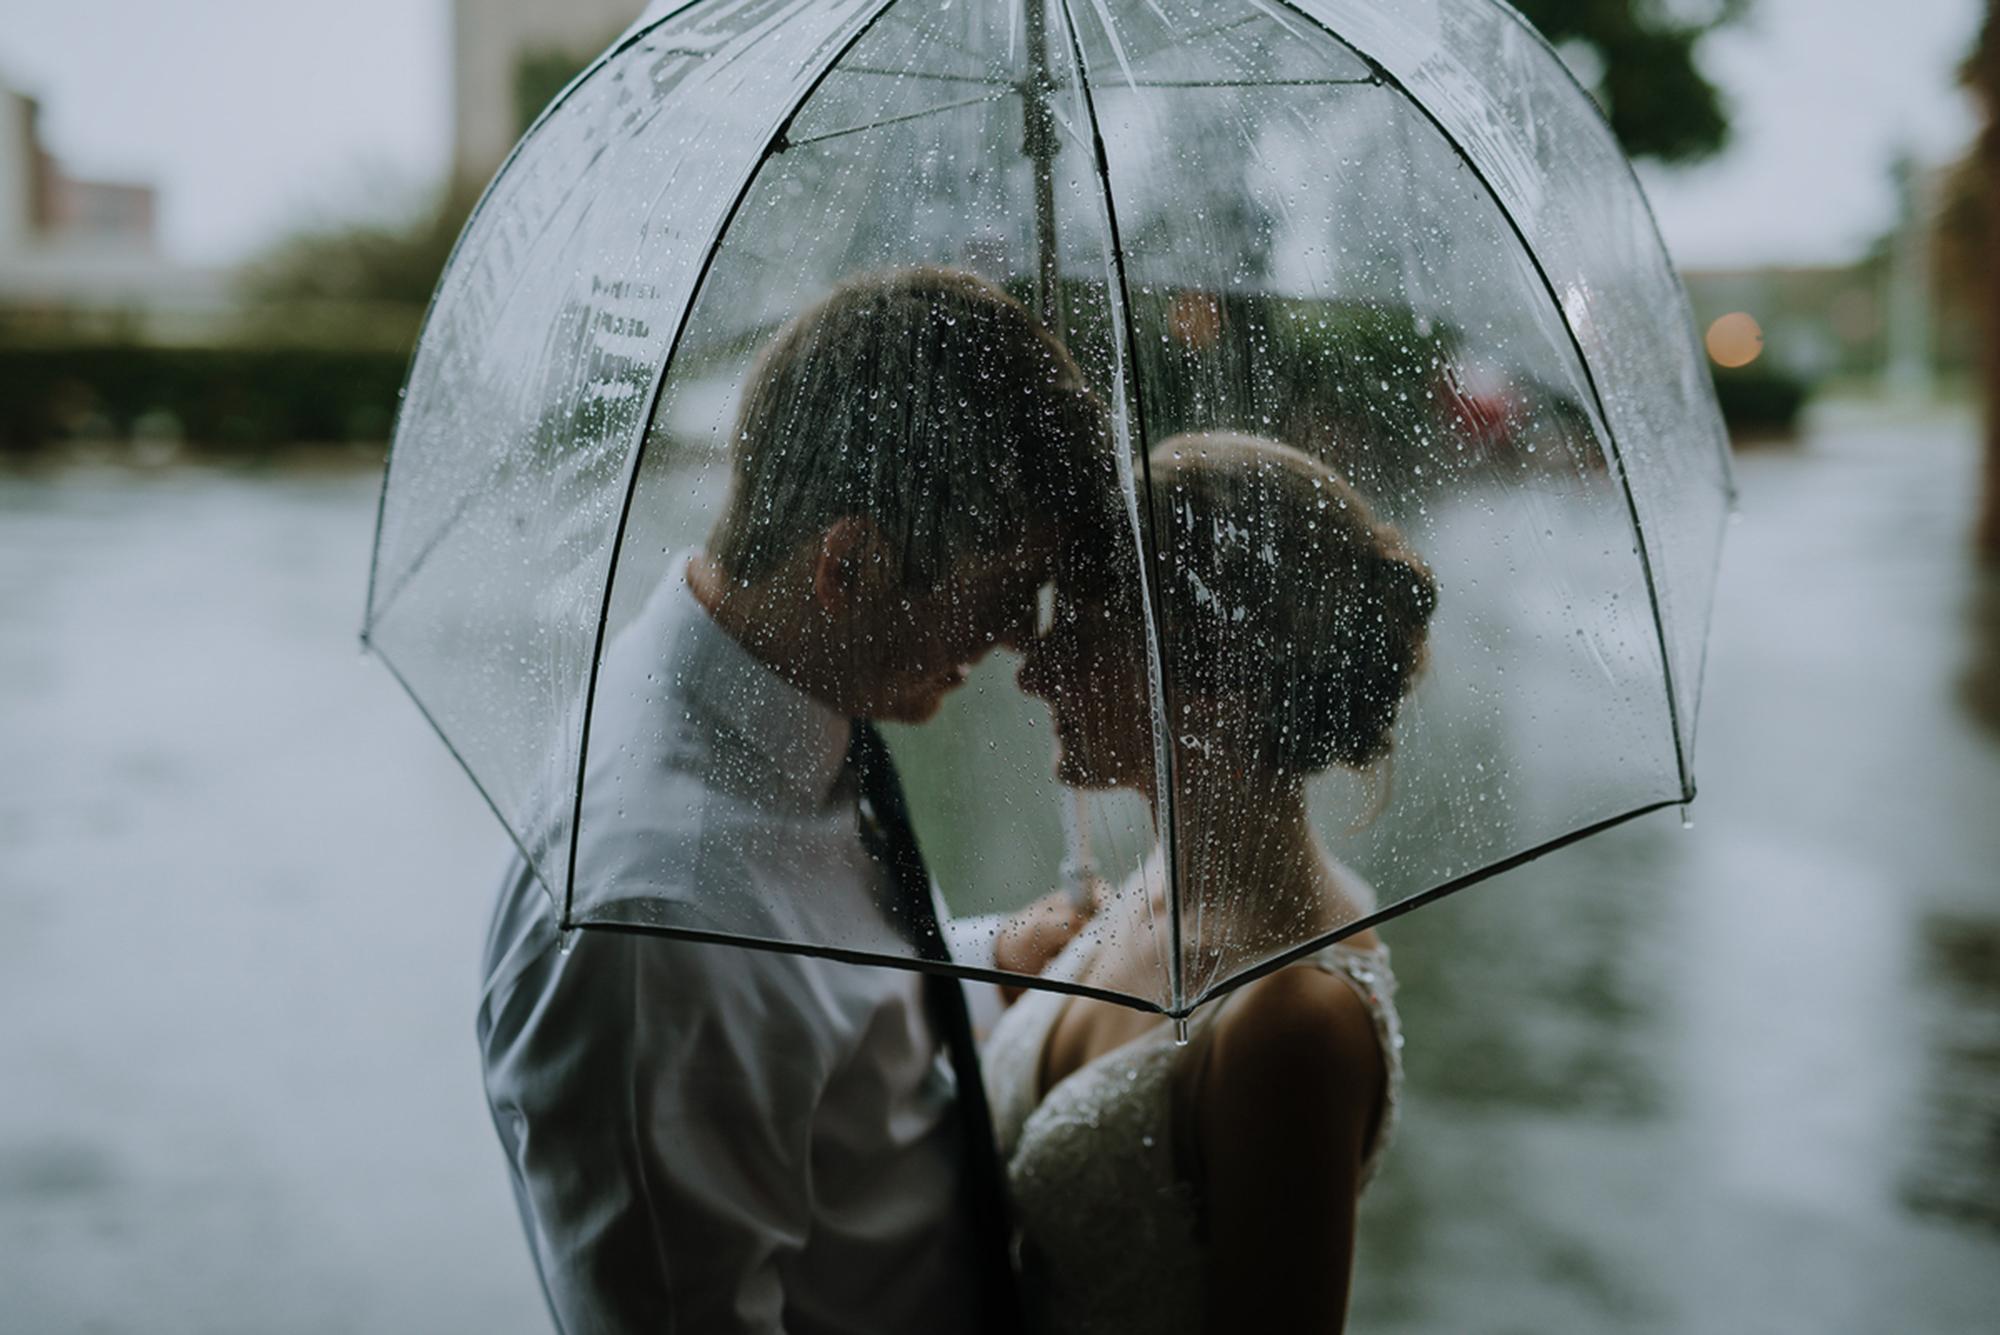 Rainey Wedding Day with Bride and Groom under umbrella